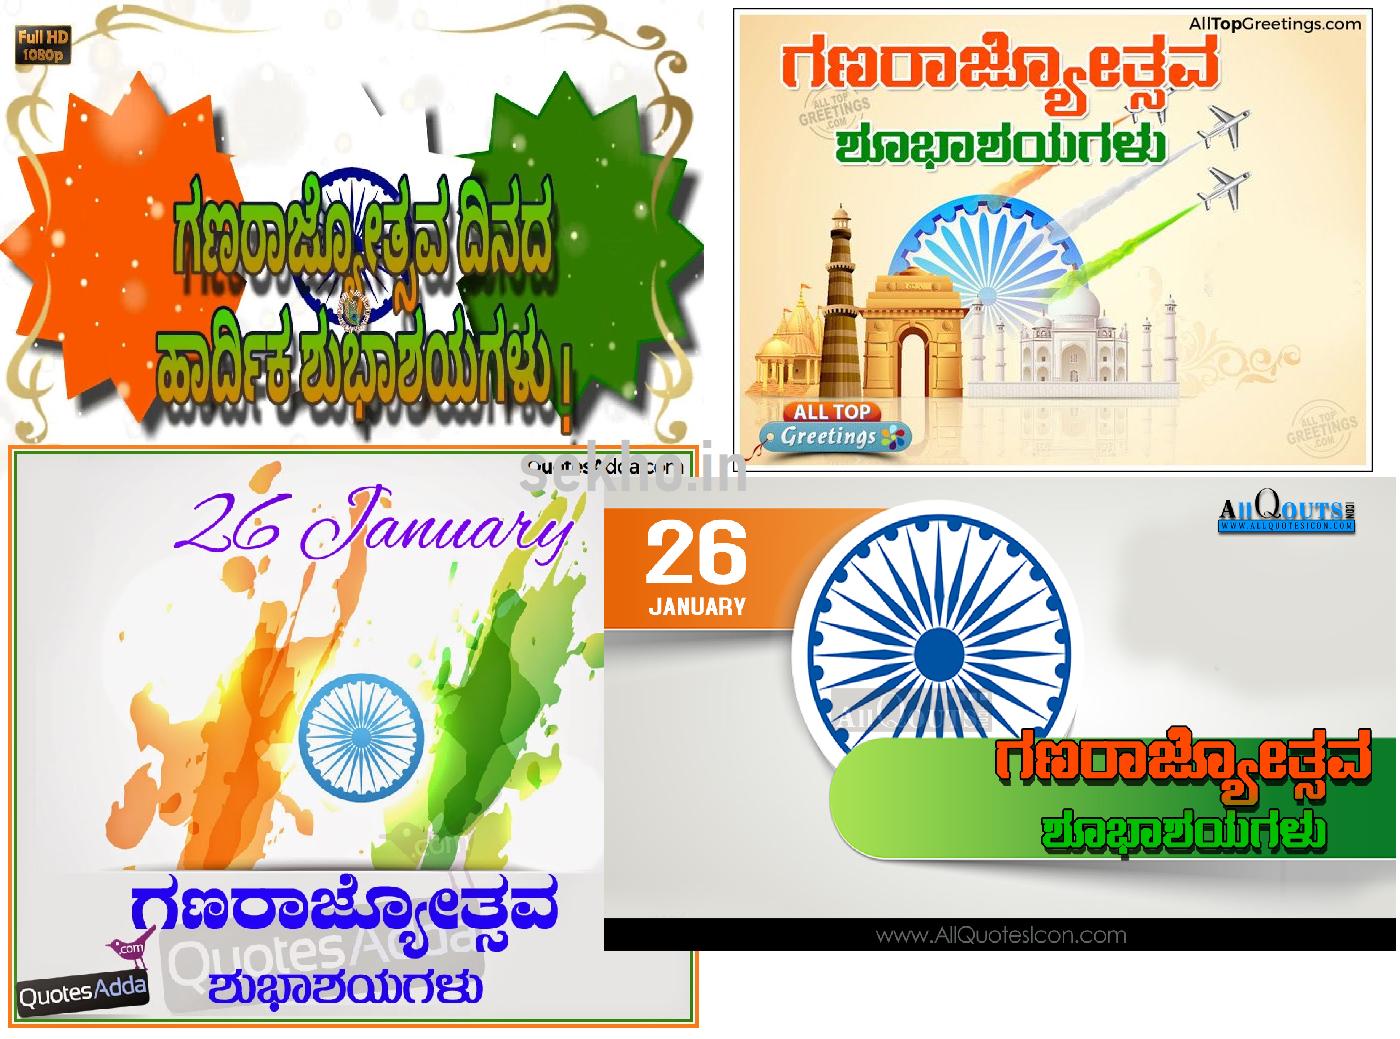 Republic Day Wishes In Kannada